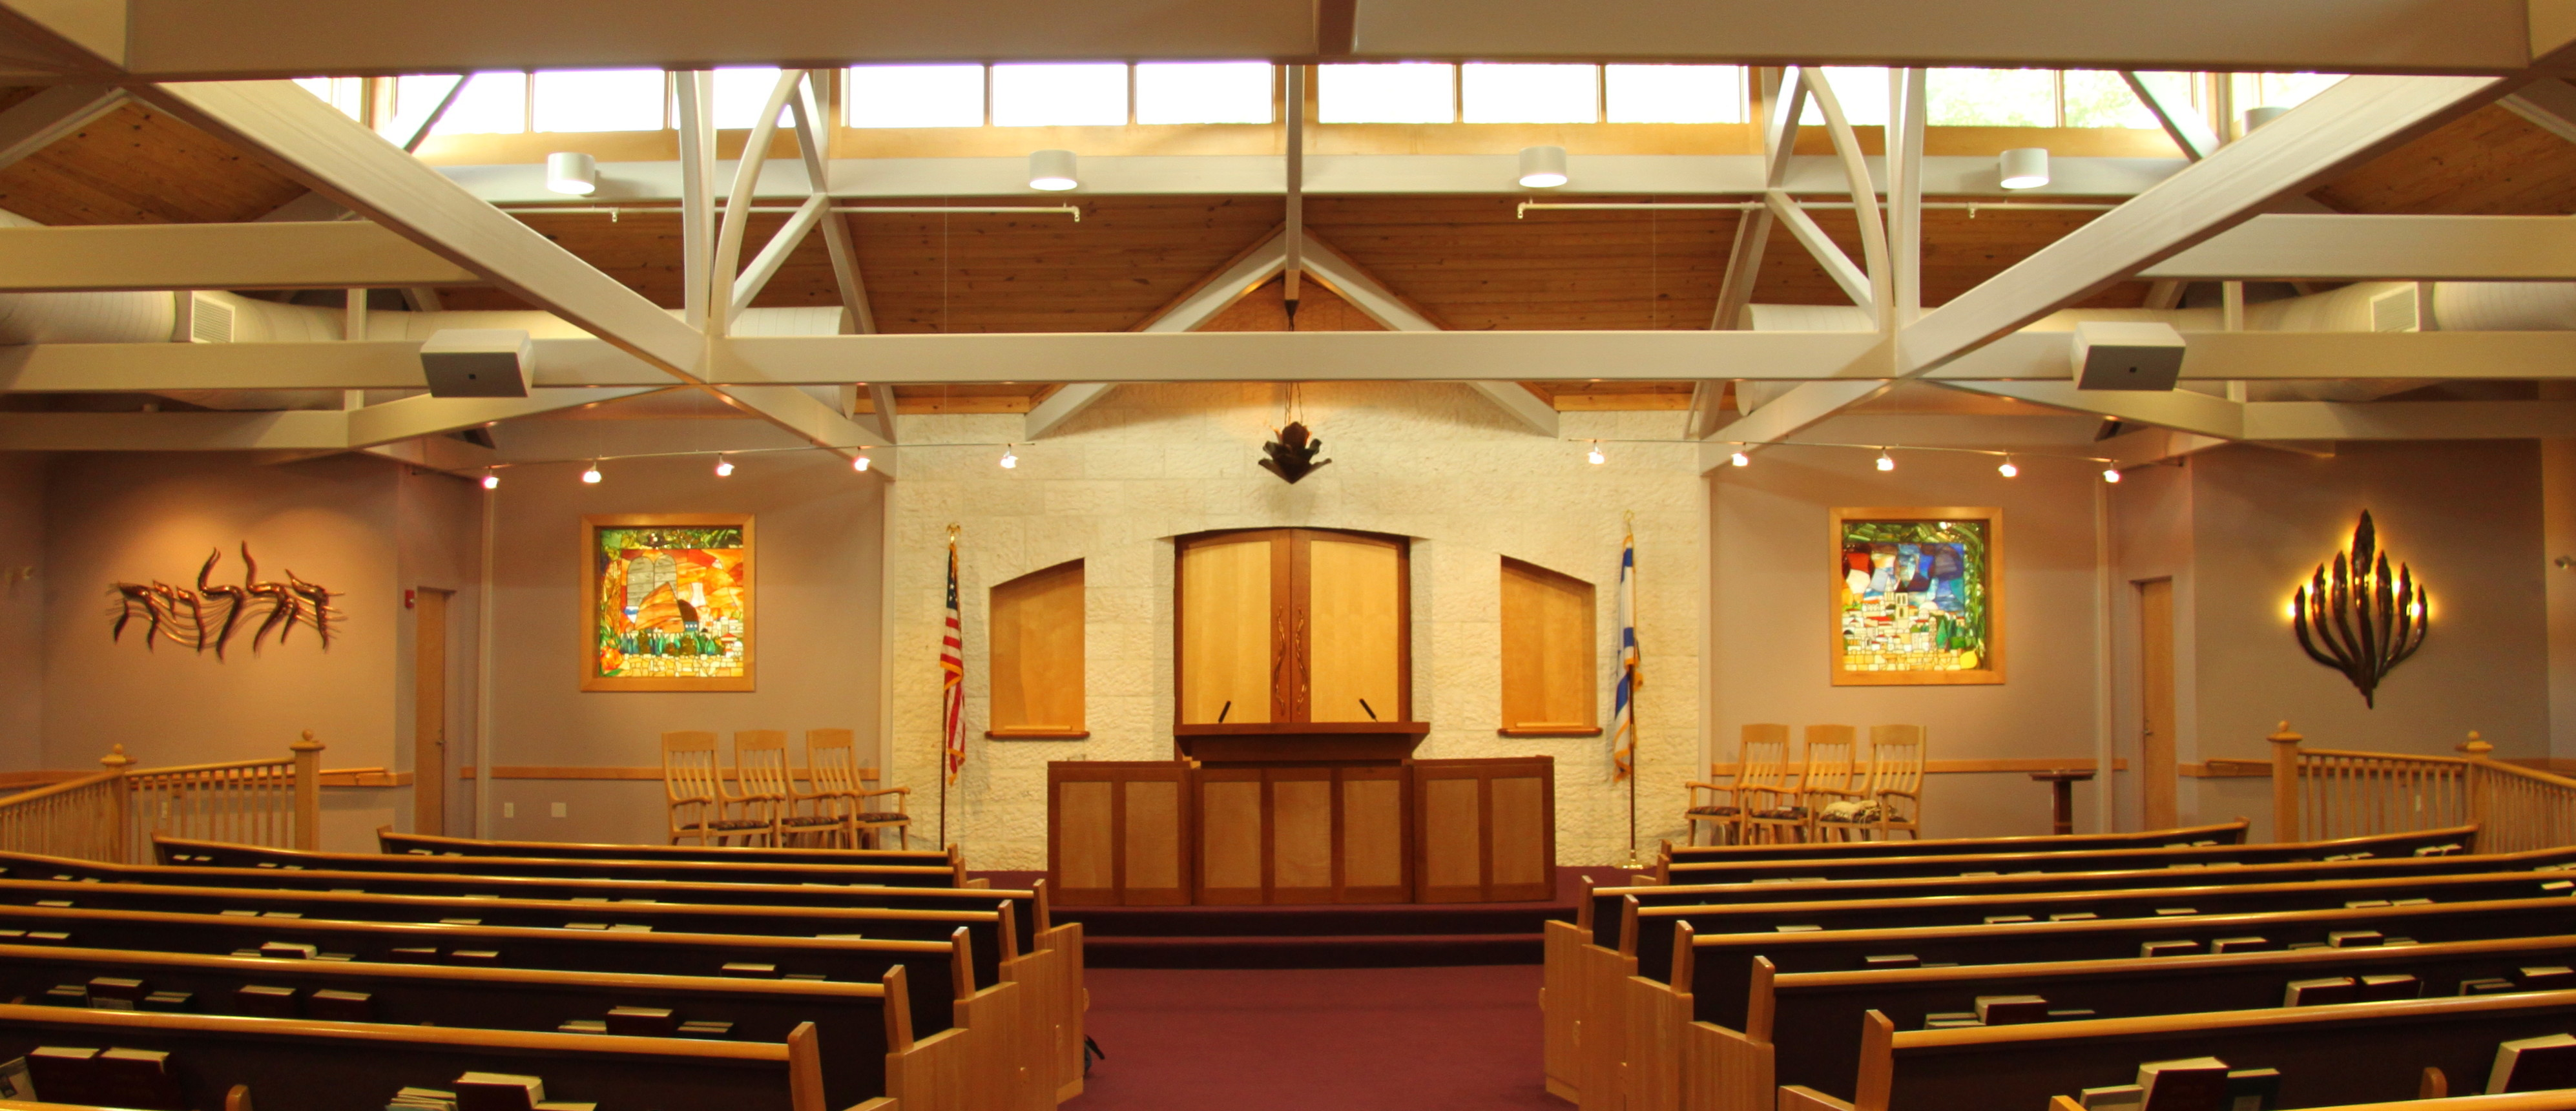 Sanctuary of Temple Beth Abraham